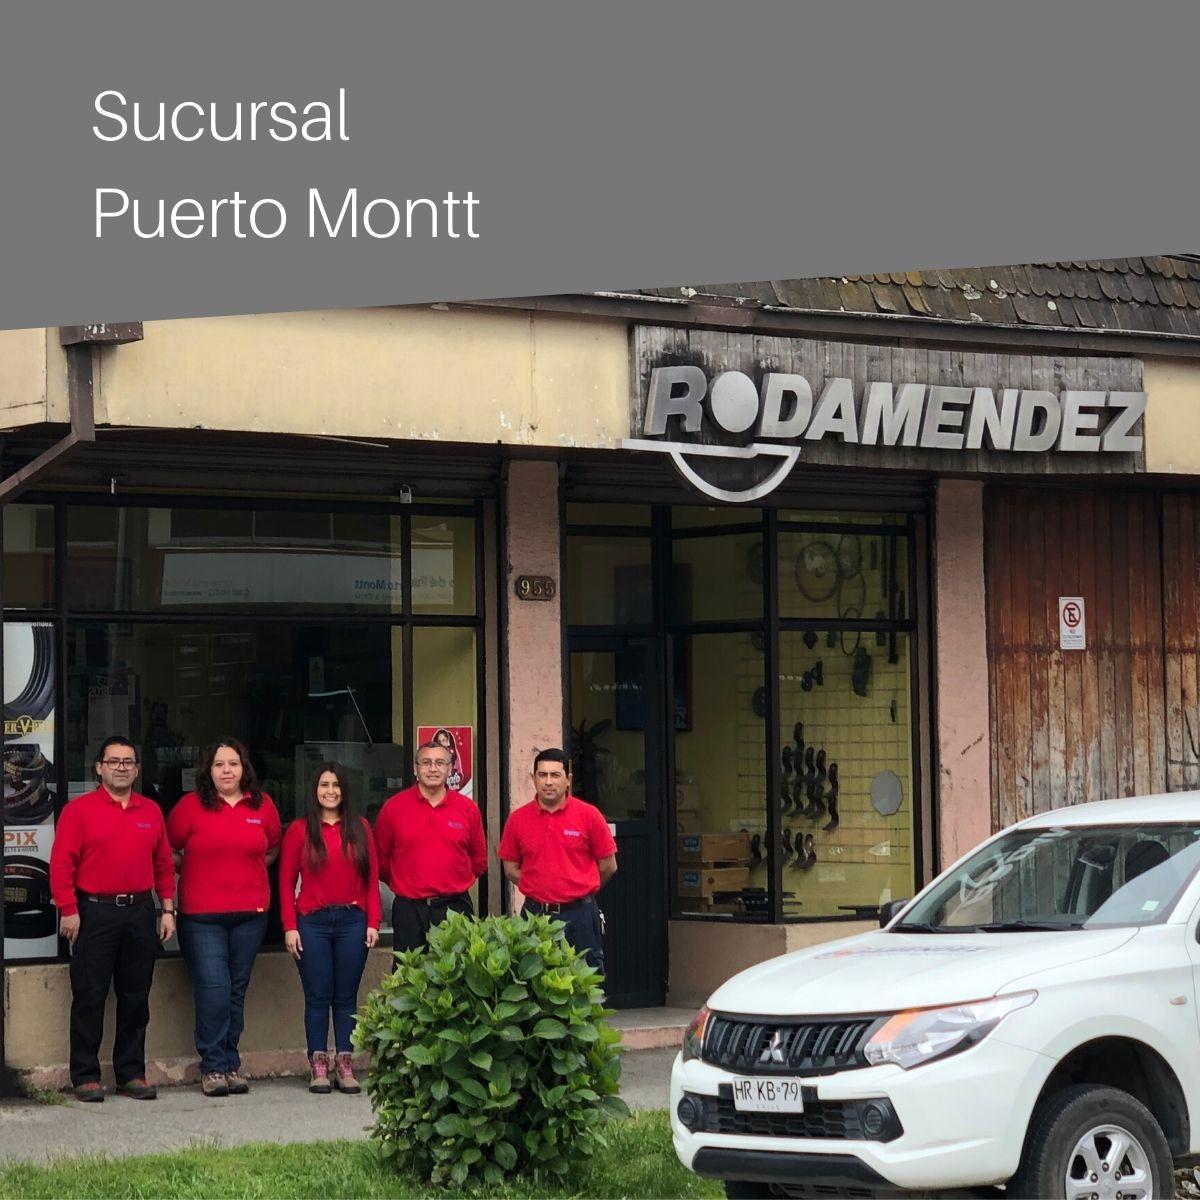 Rodamientos Puerto Montt